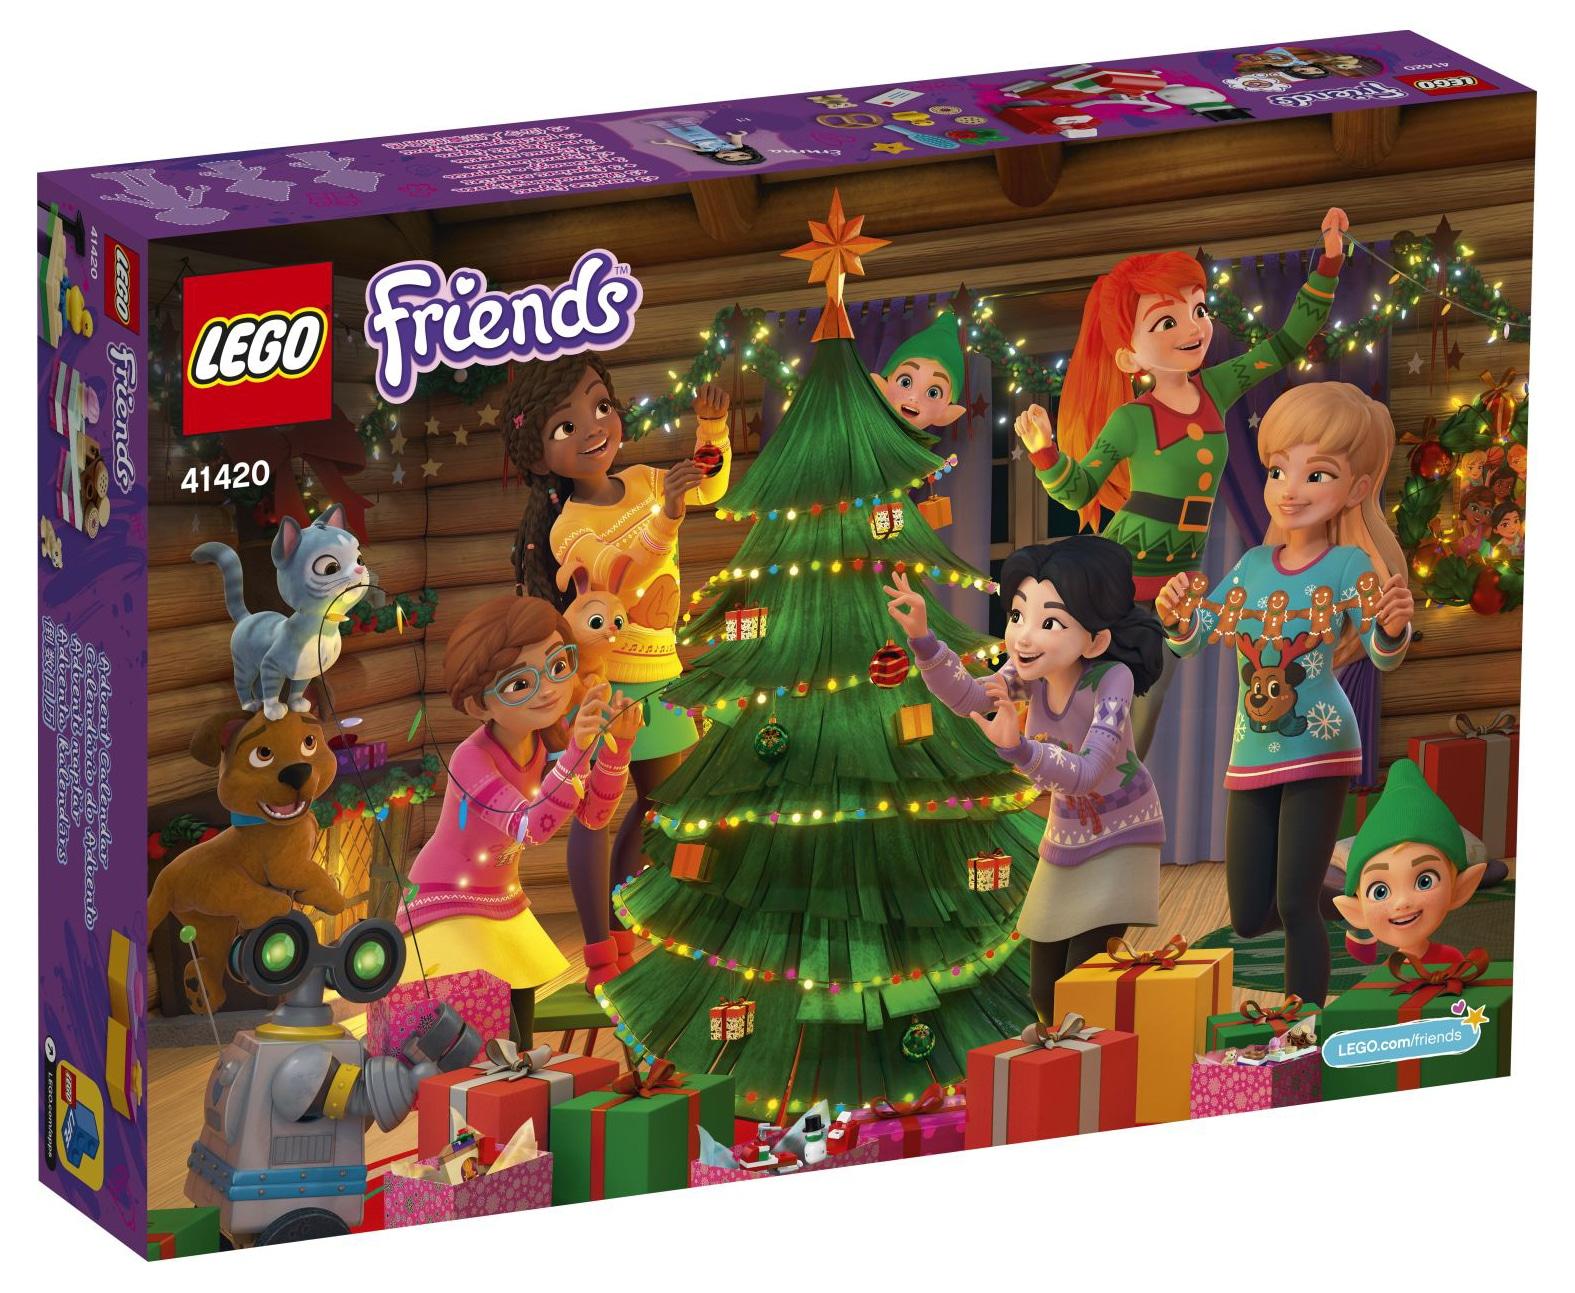 LEGO Friends Adventskalender 2020 41420 (3)